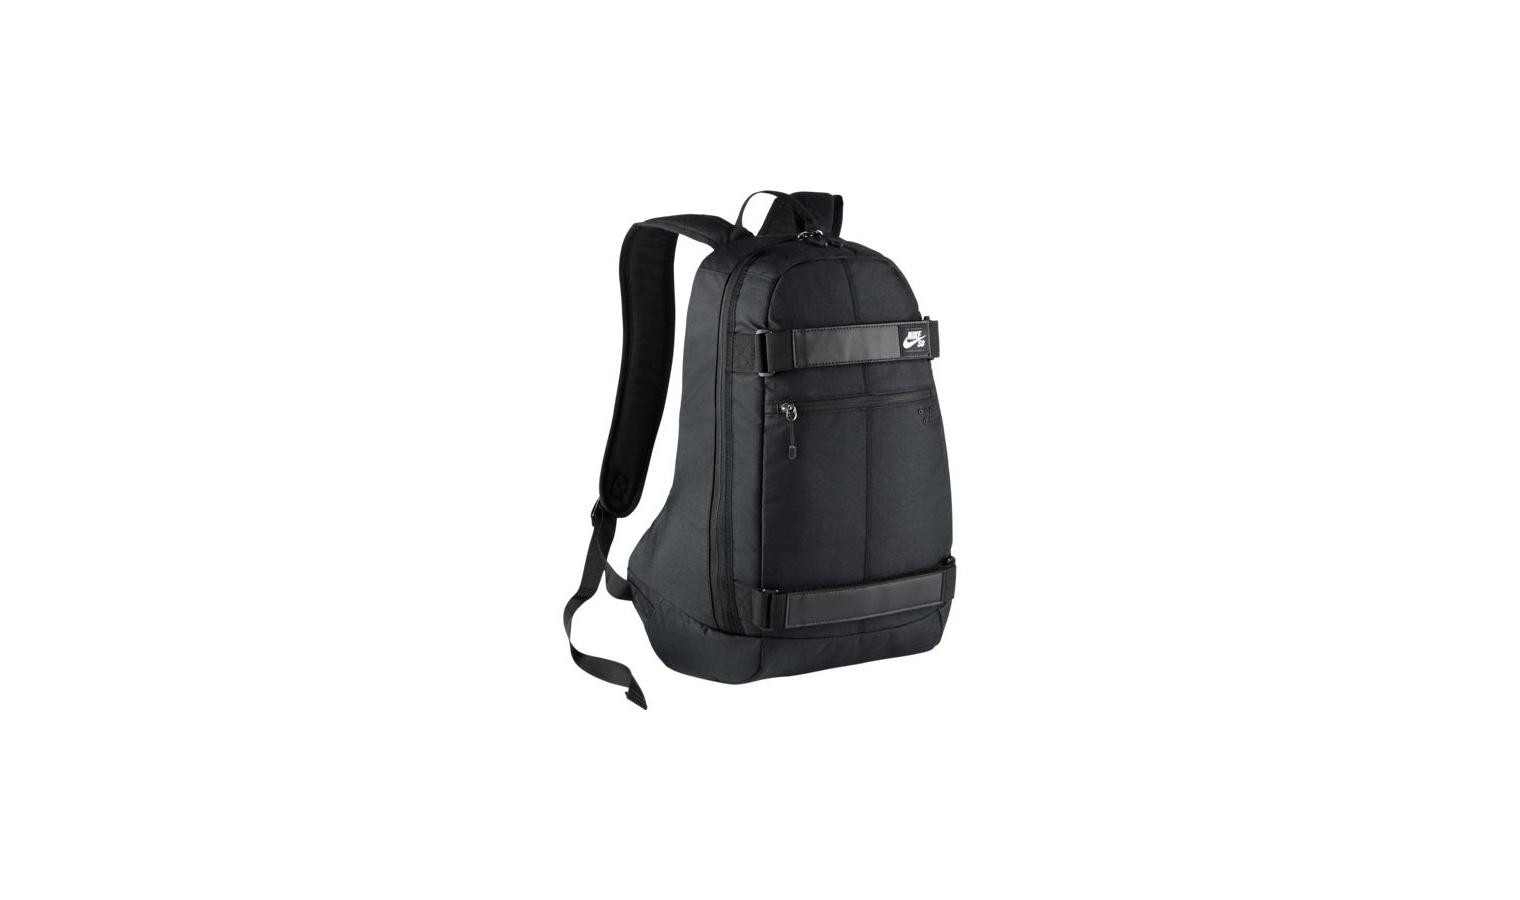 Pánský batoh Nike SB EMBARCA (MEDIUM) černý  0edfe4bd44